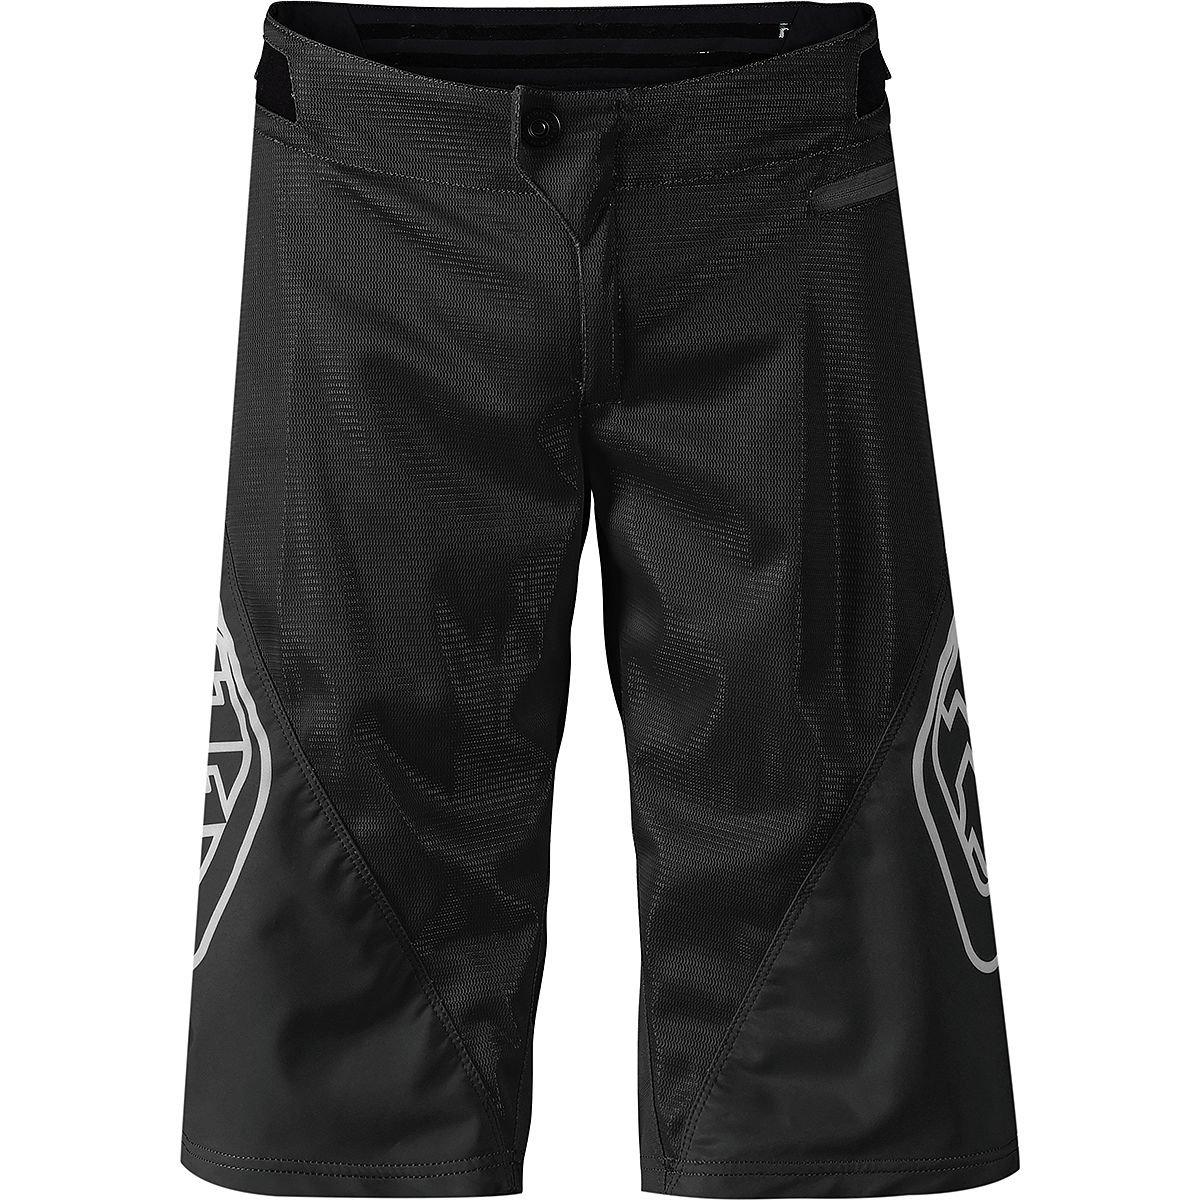 Troy Lee Designs Sprint Shorts - Boys' Solid Black, 18